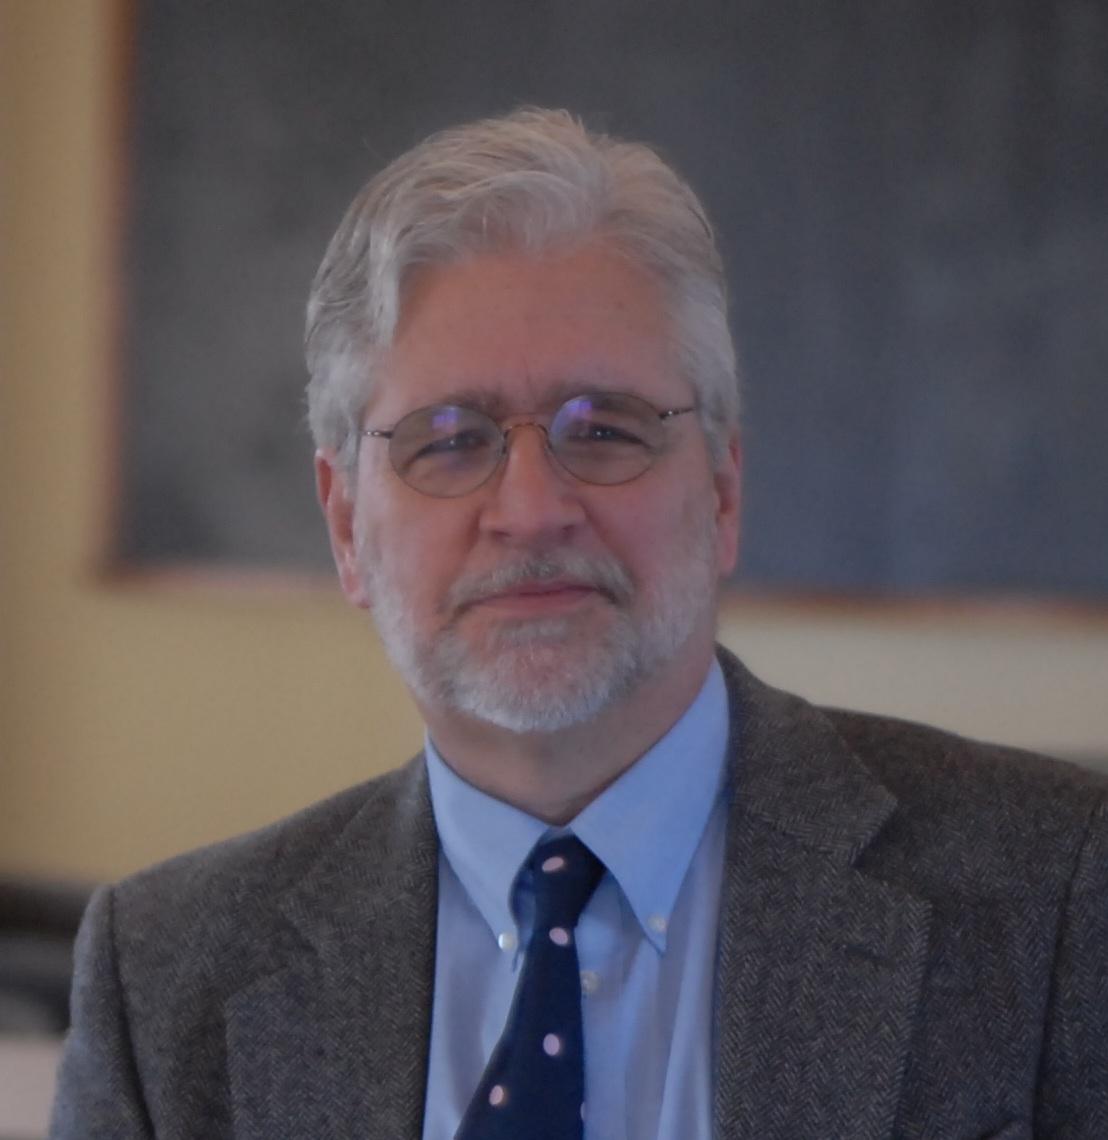 Professor Paul Zorn, President of MAA